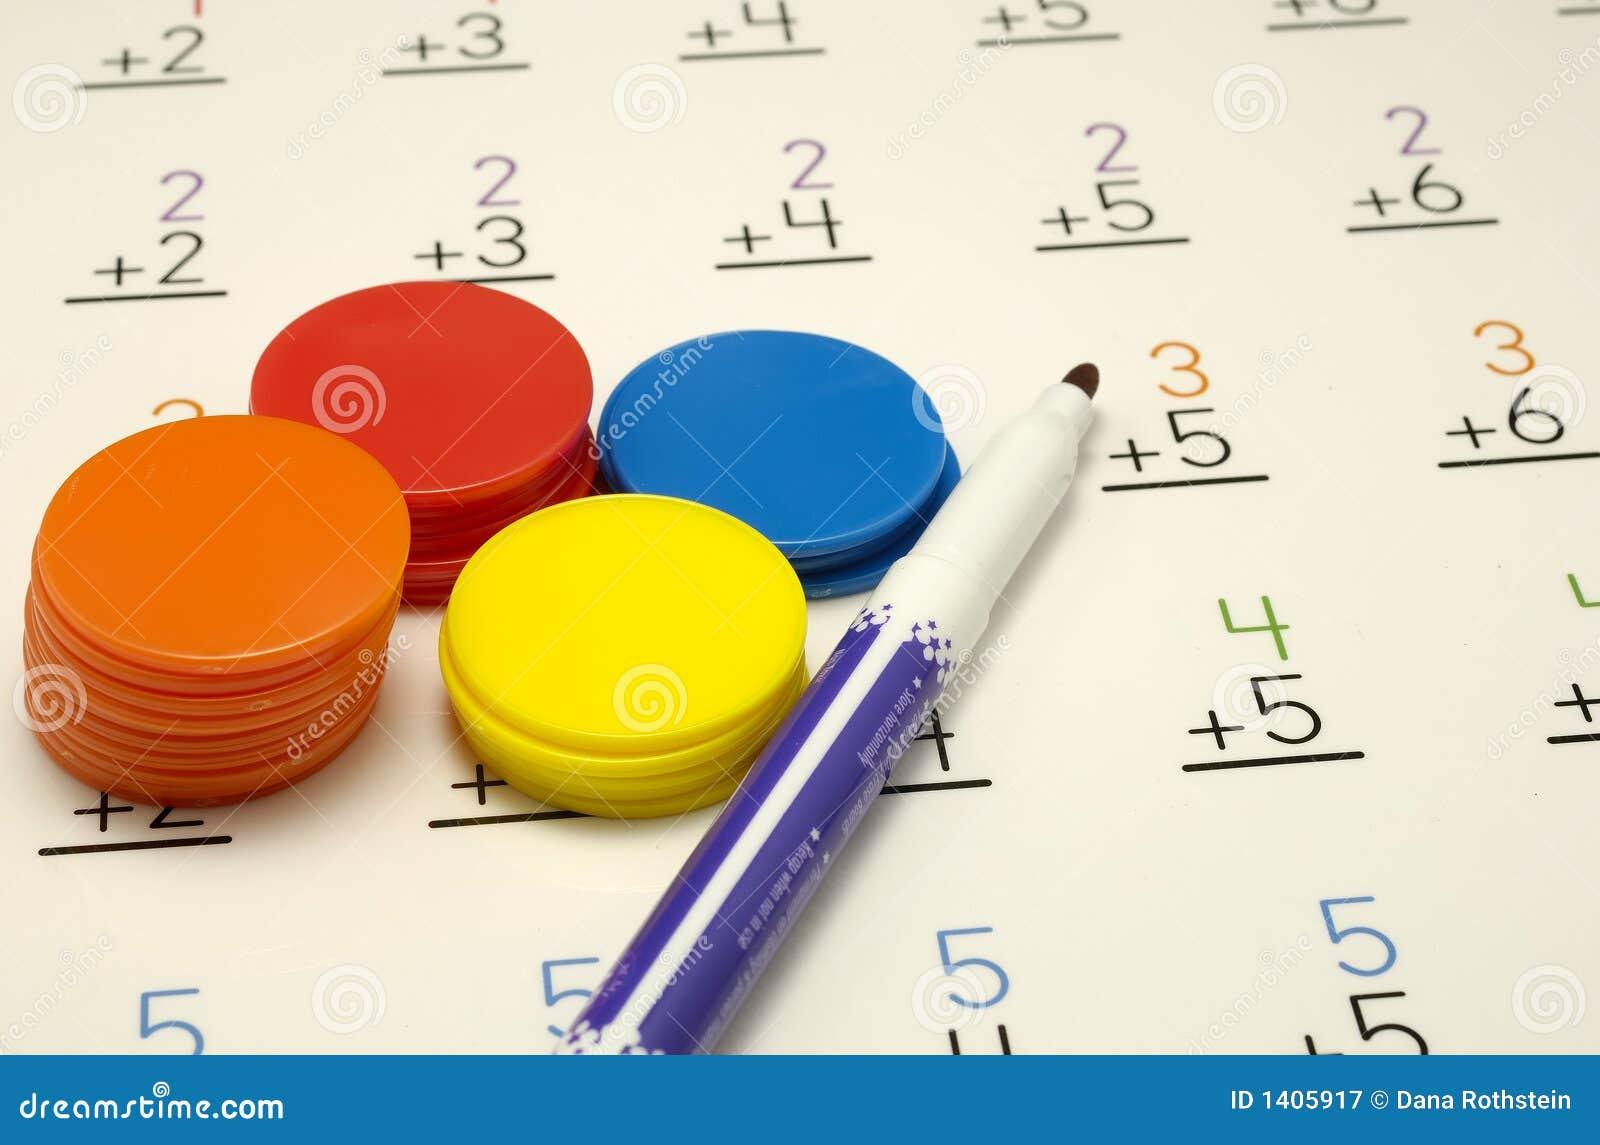 Mathe stockbild. Bild von bogen, praxis, mathe, learn - 1405917